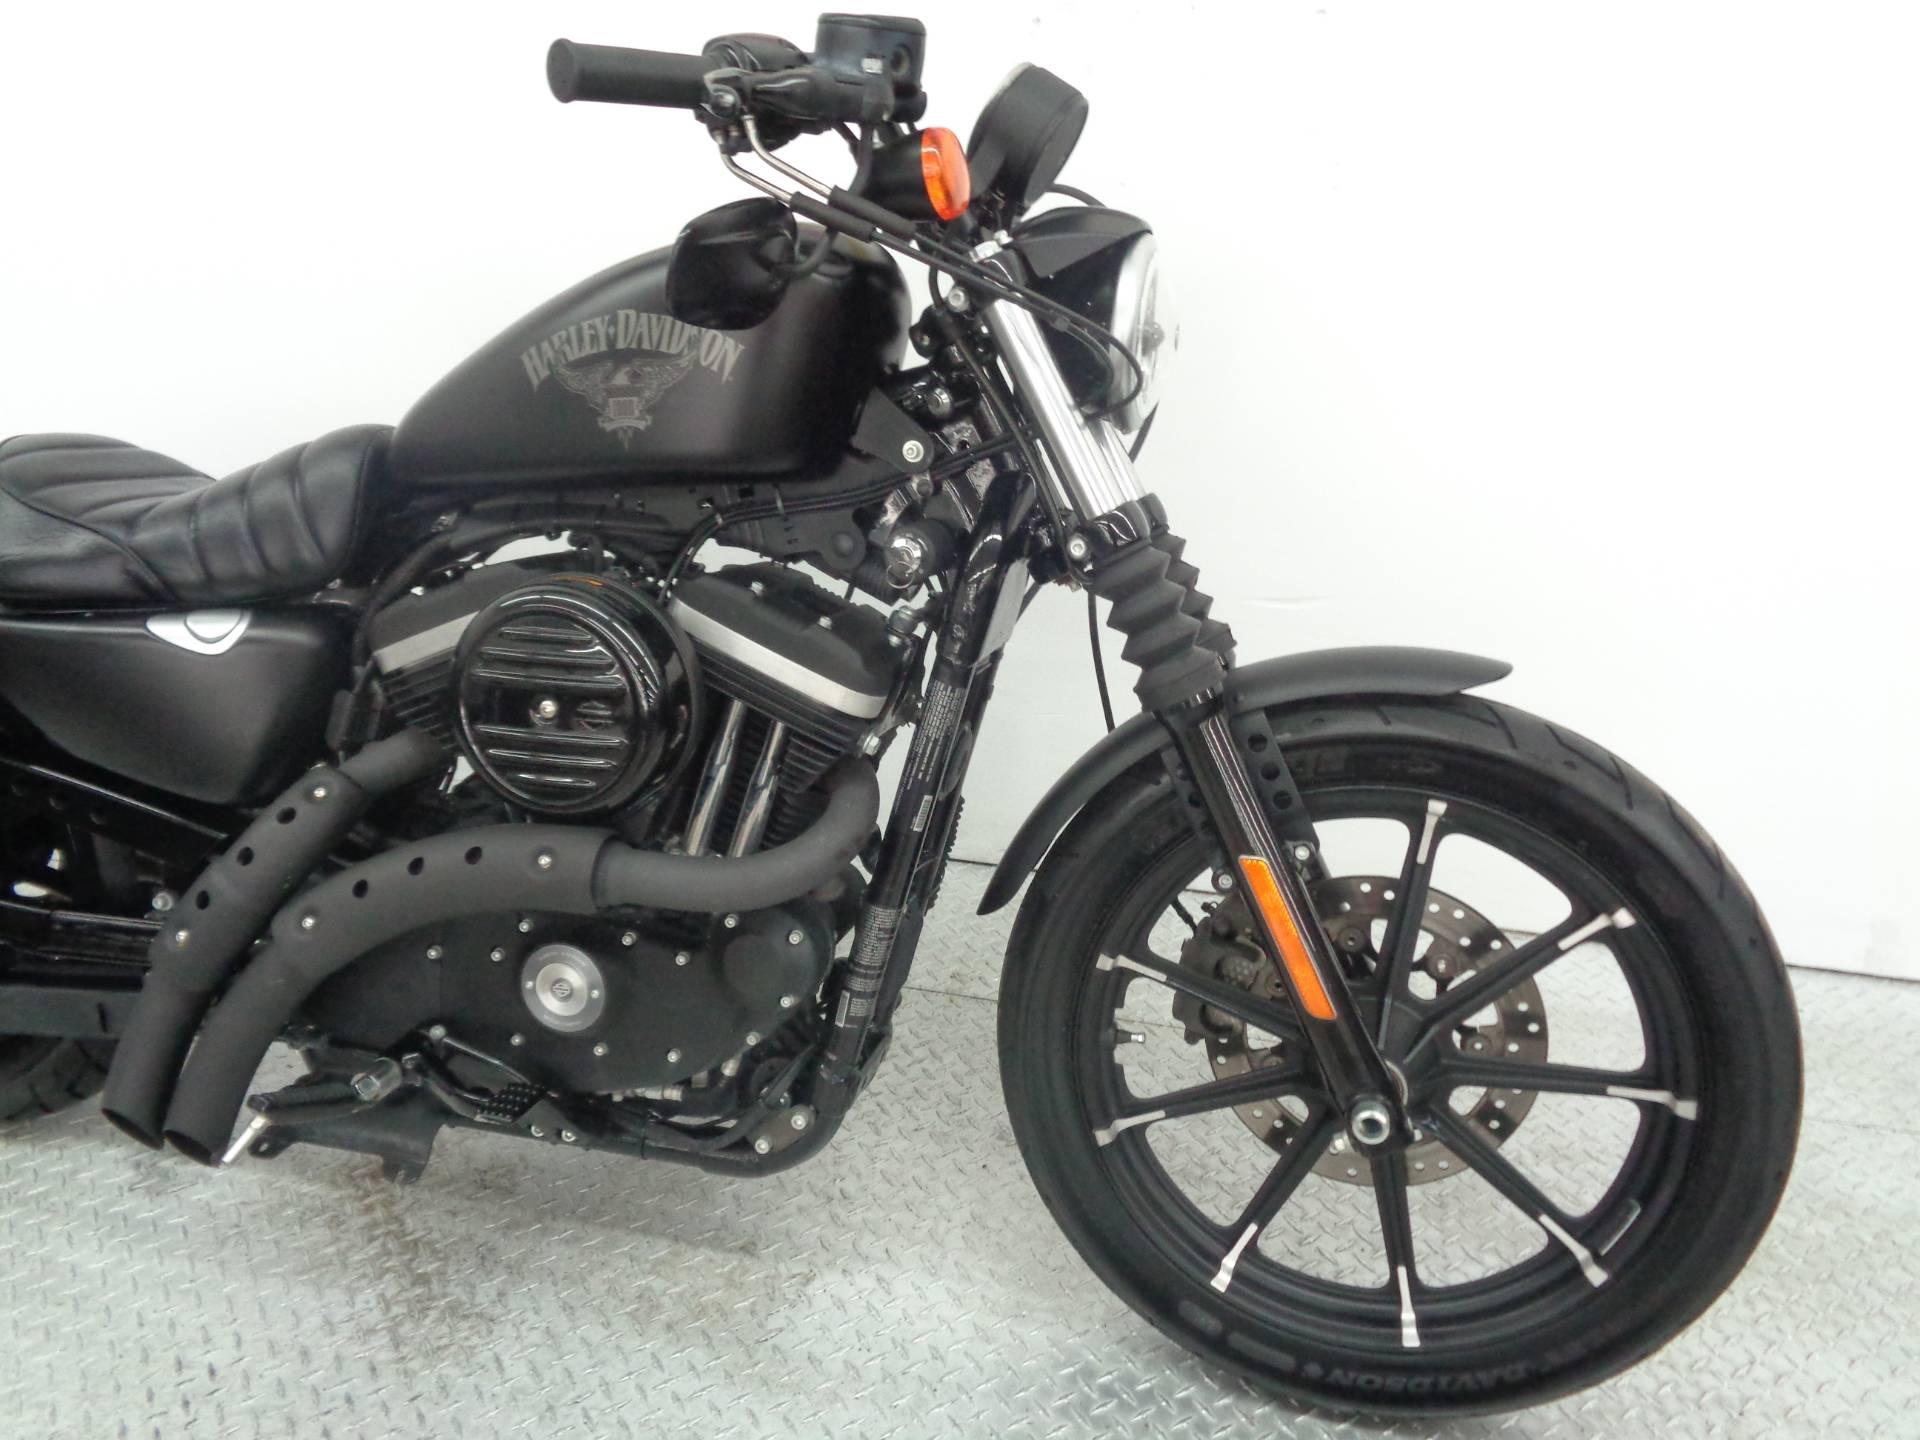 2016 Harley-Davidson Iron 883 8